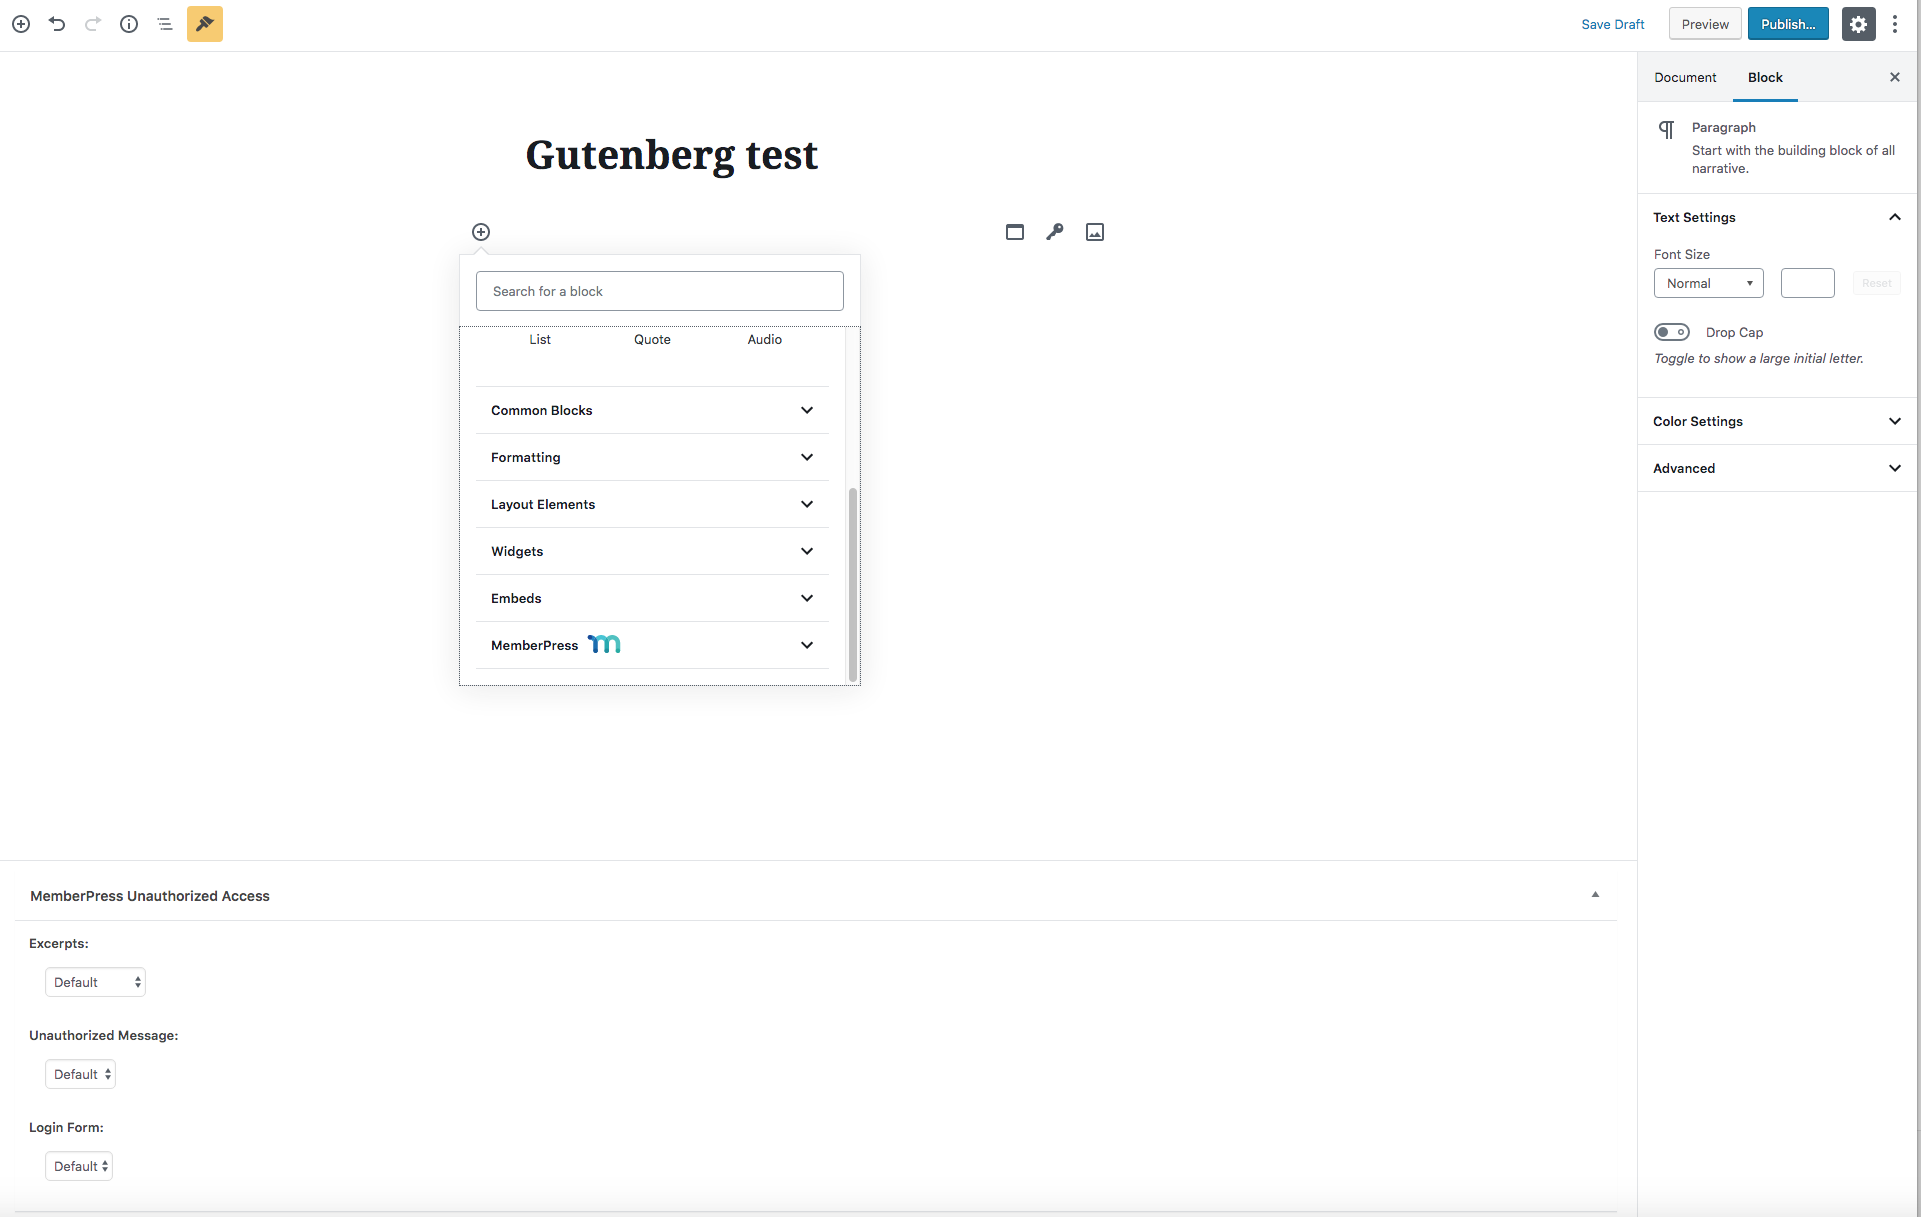 Available Gutenberg Blocks - MemberPress User Manual